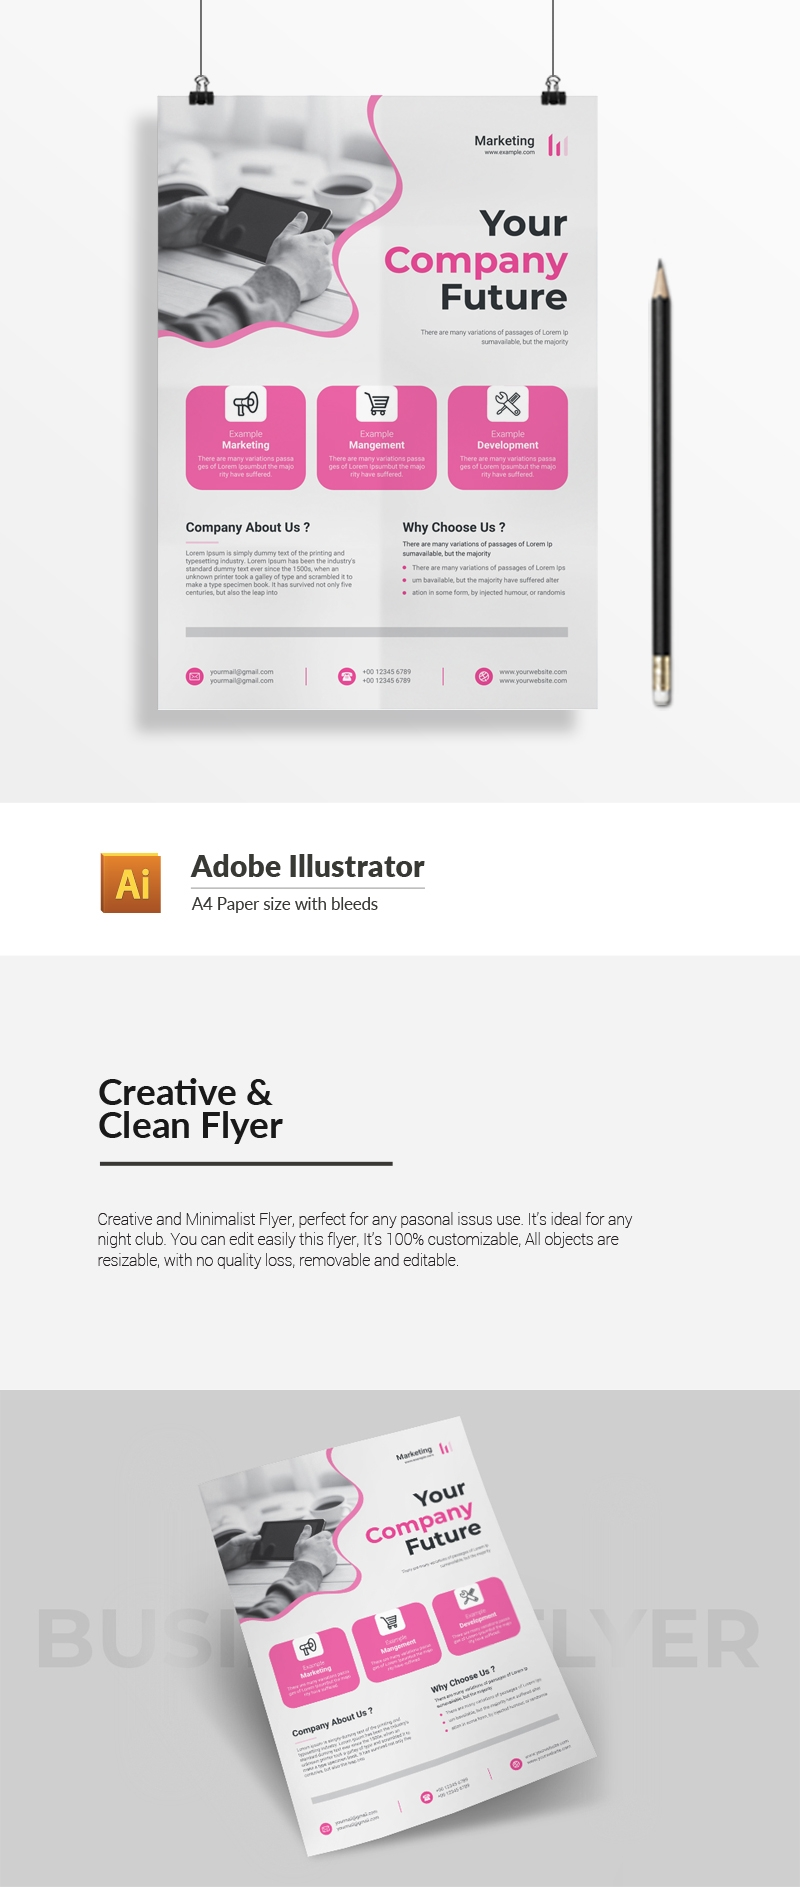 Creative & Clean Flyer